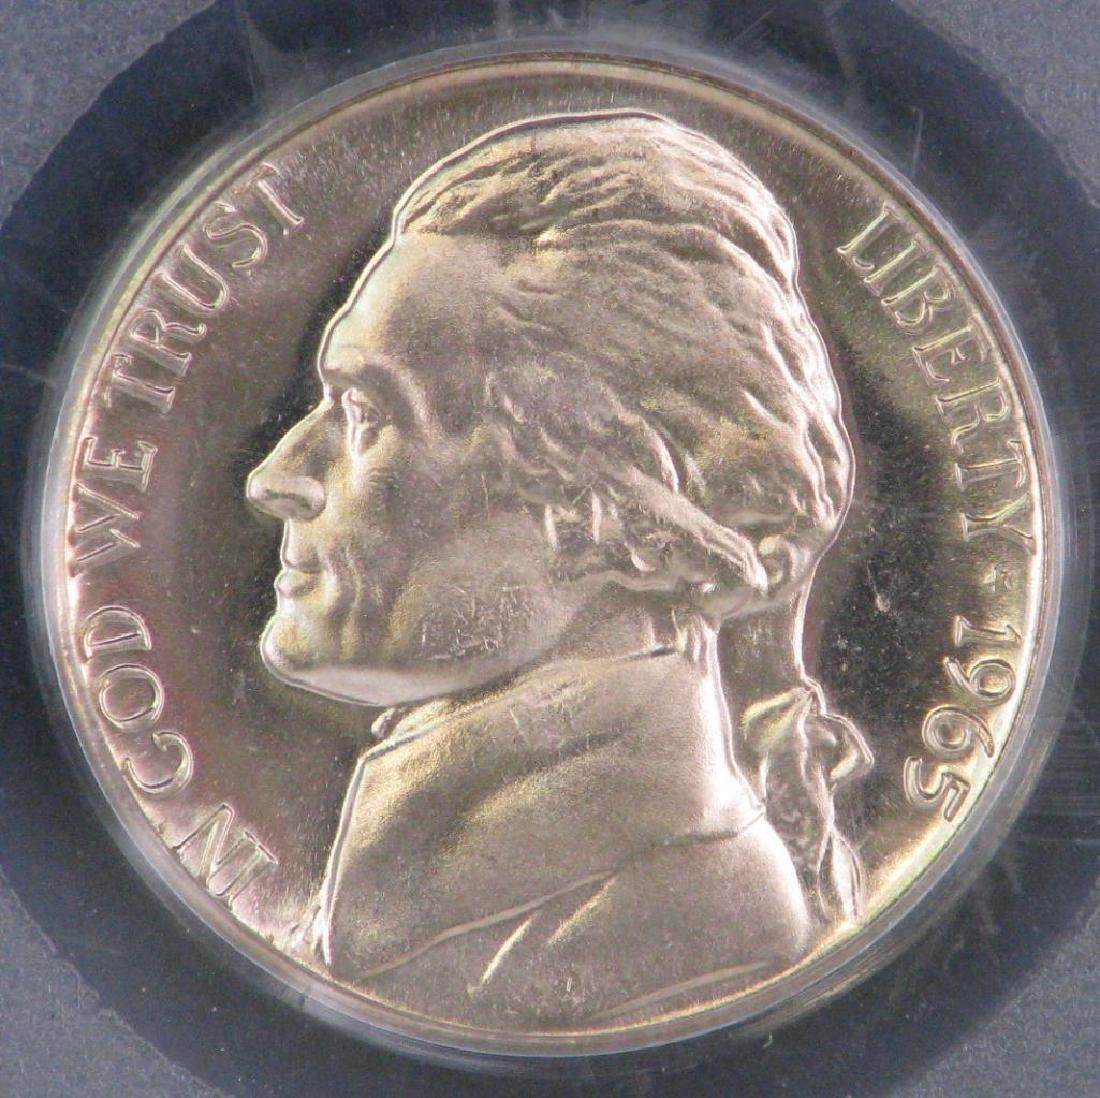 Lot of 2 : Jefferson Nickels (1950-P + 1965-P) - 4